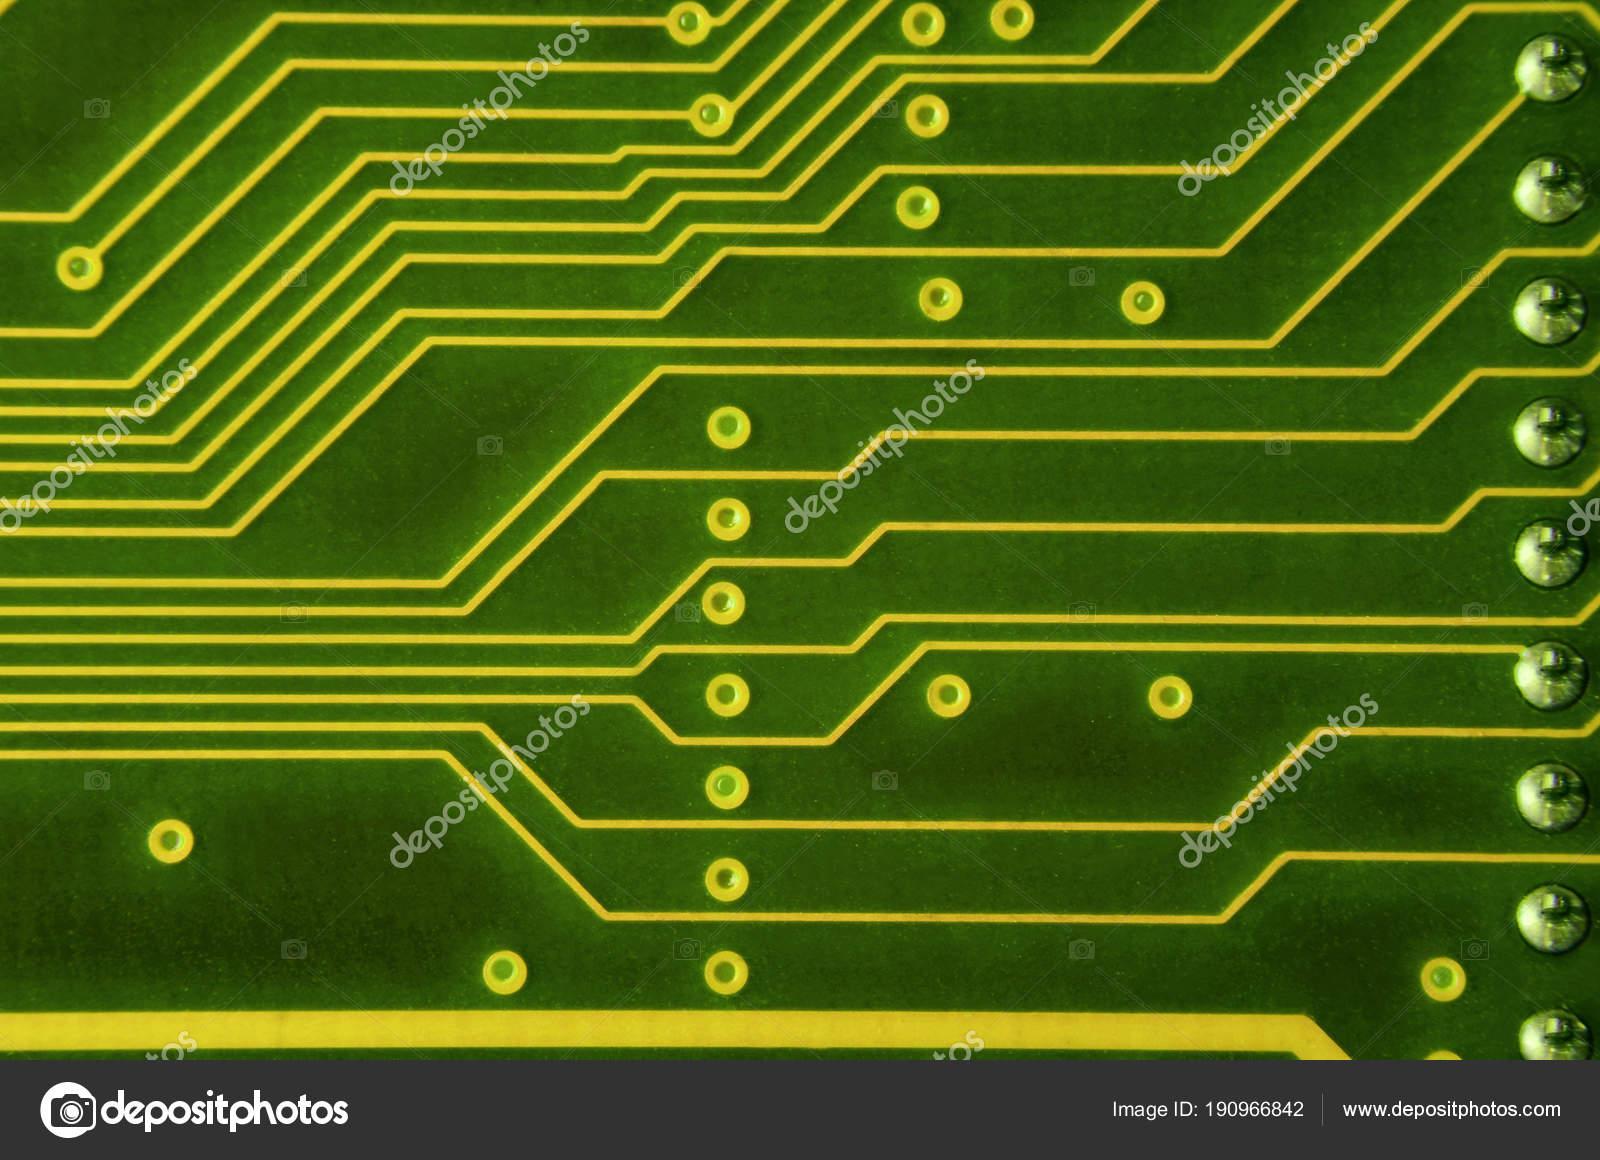 Computer Circuit Board Diagram